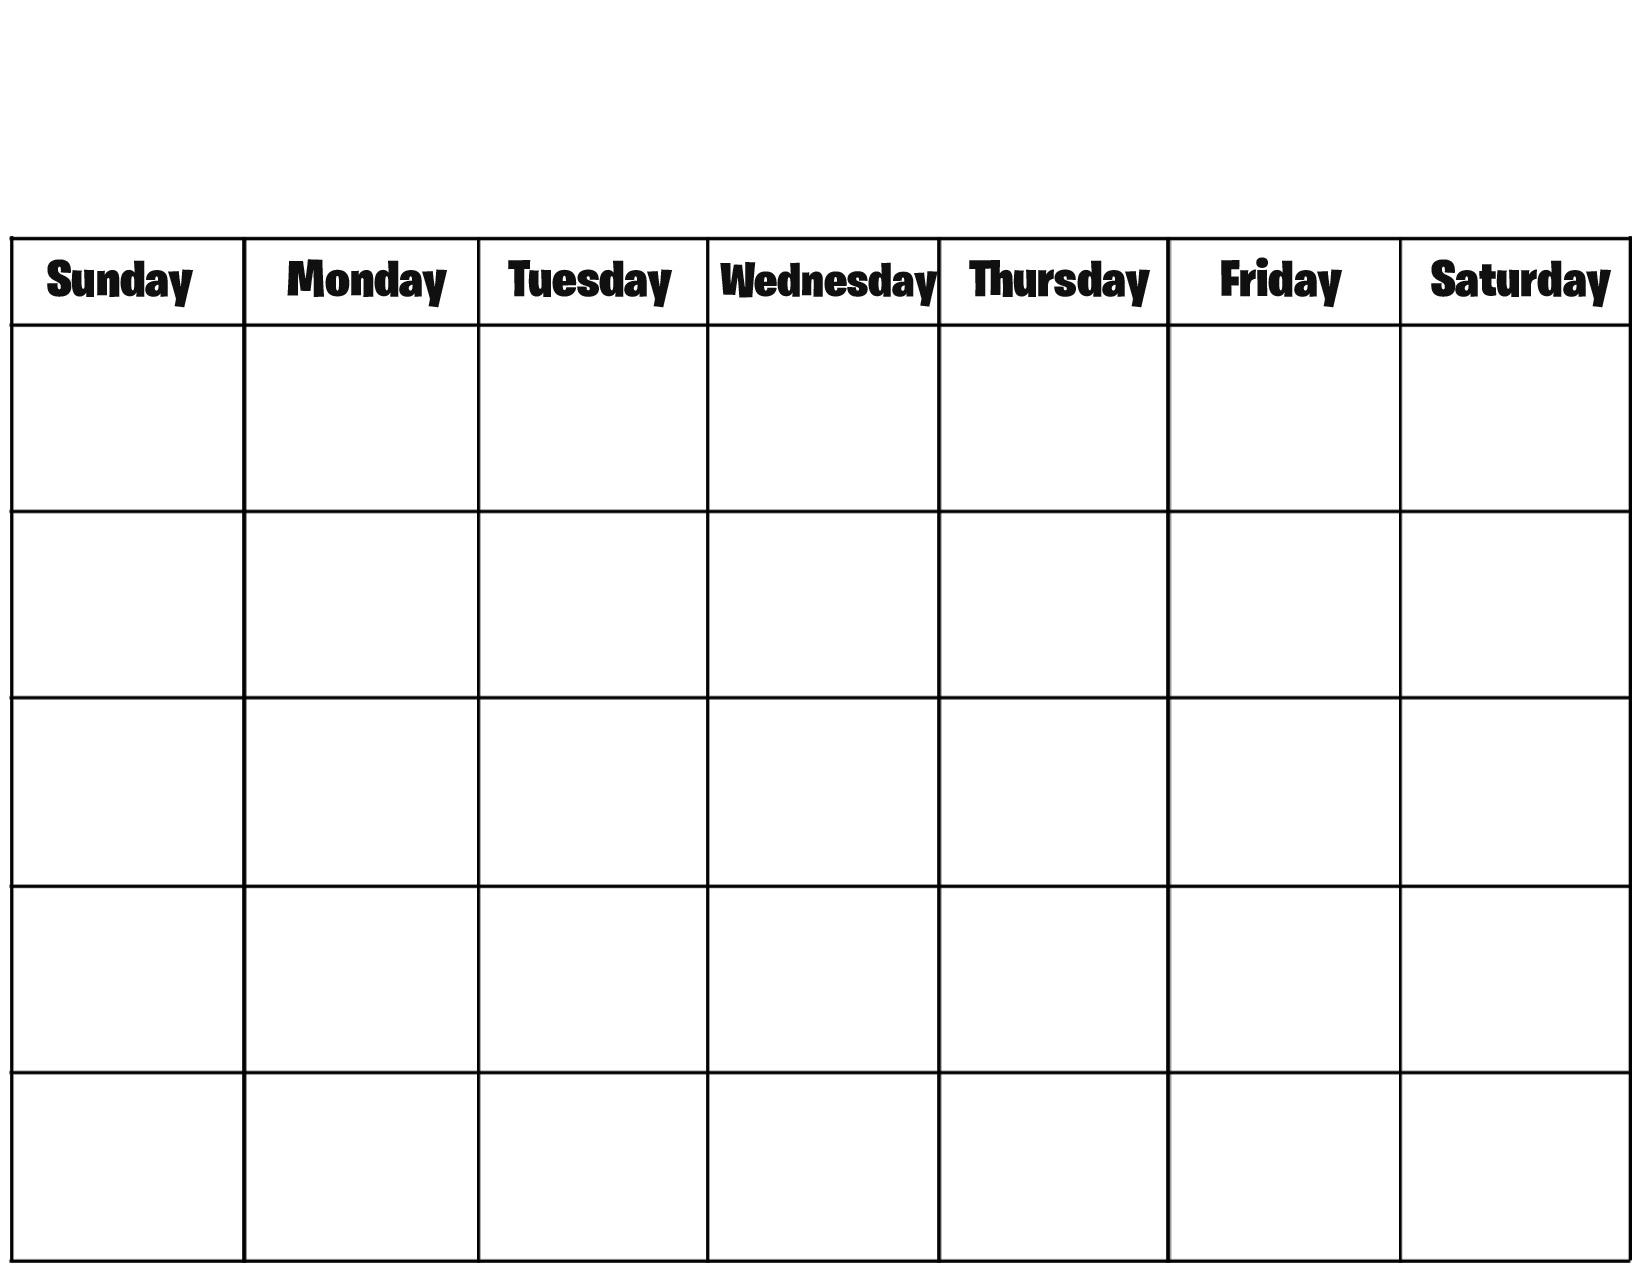 Calendar Blank To Print